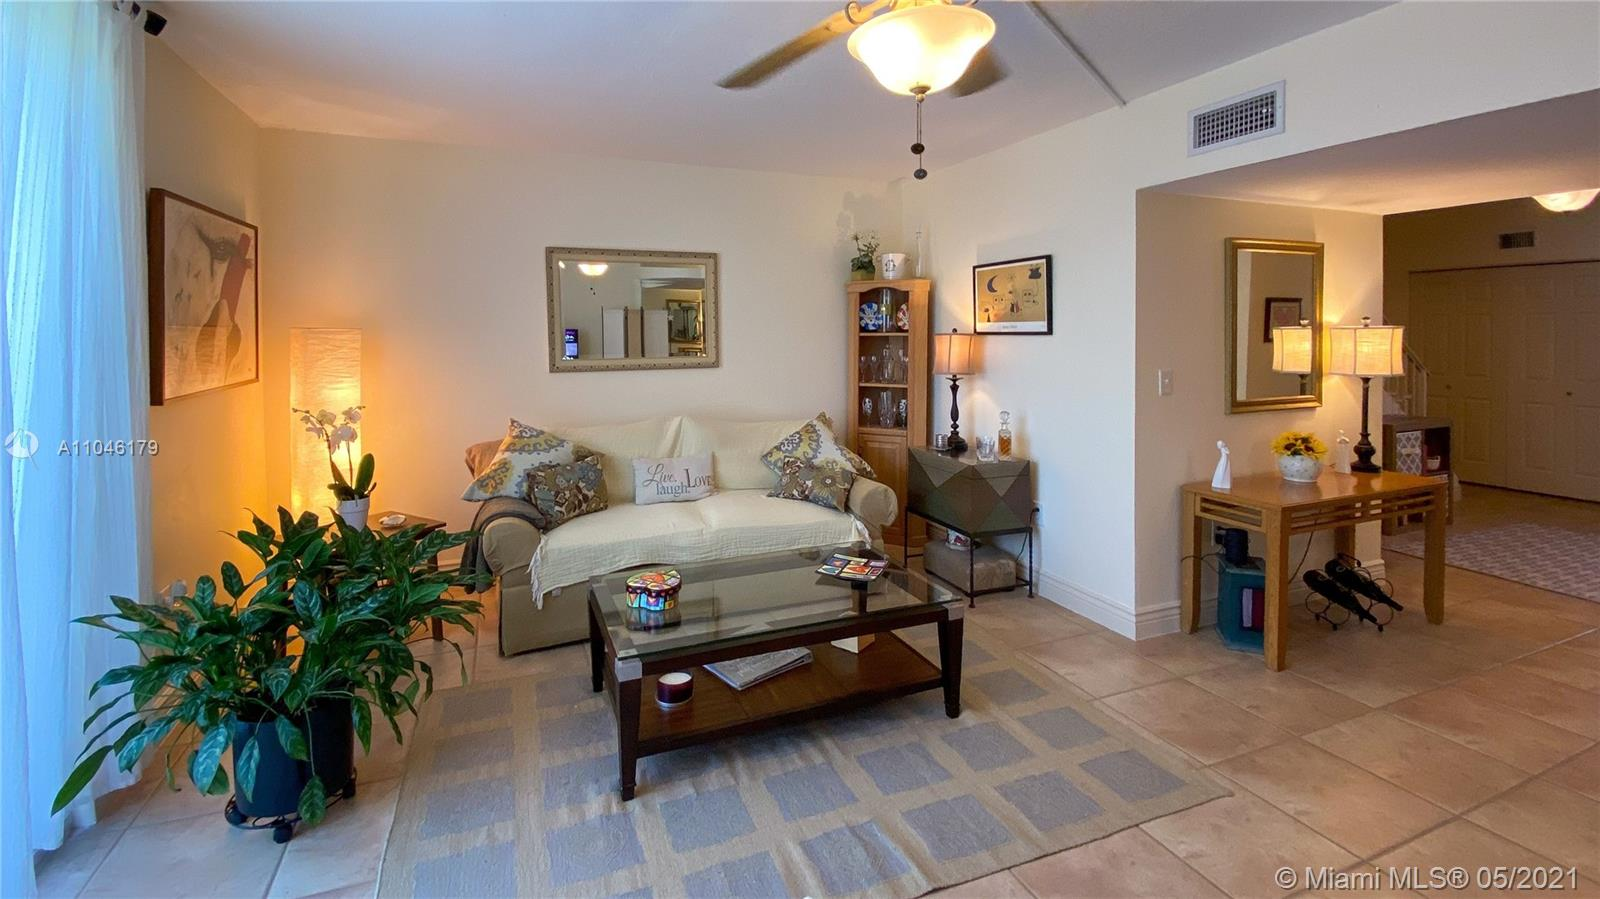 1701 NE 115th St #36A For Sale A11046179, FL